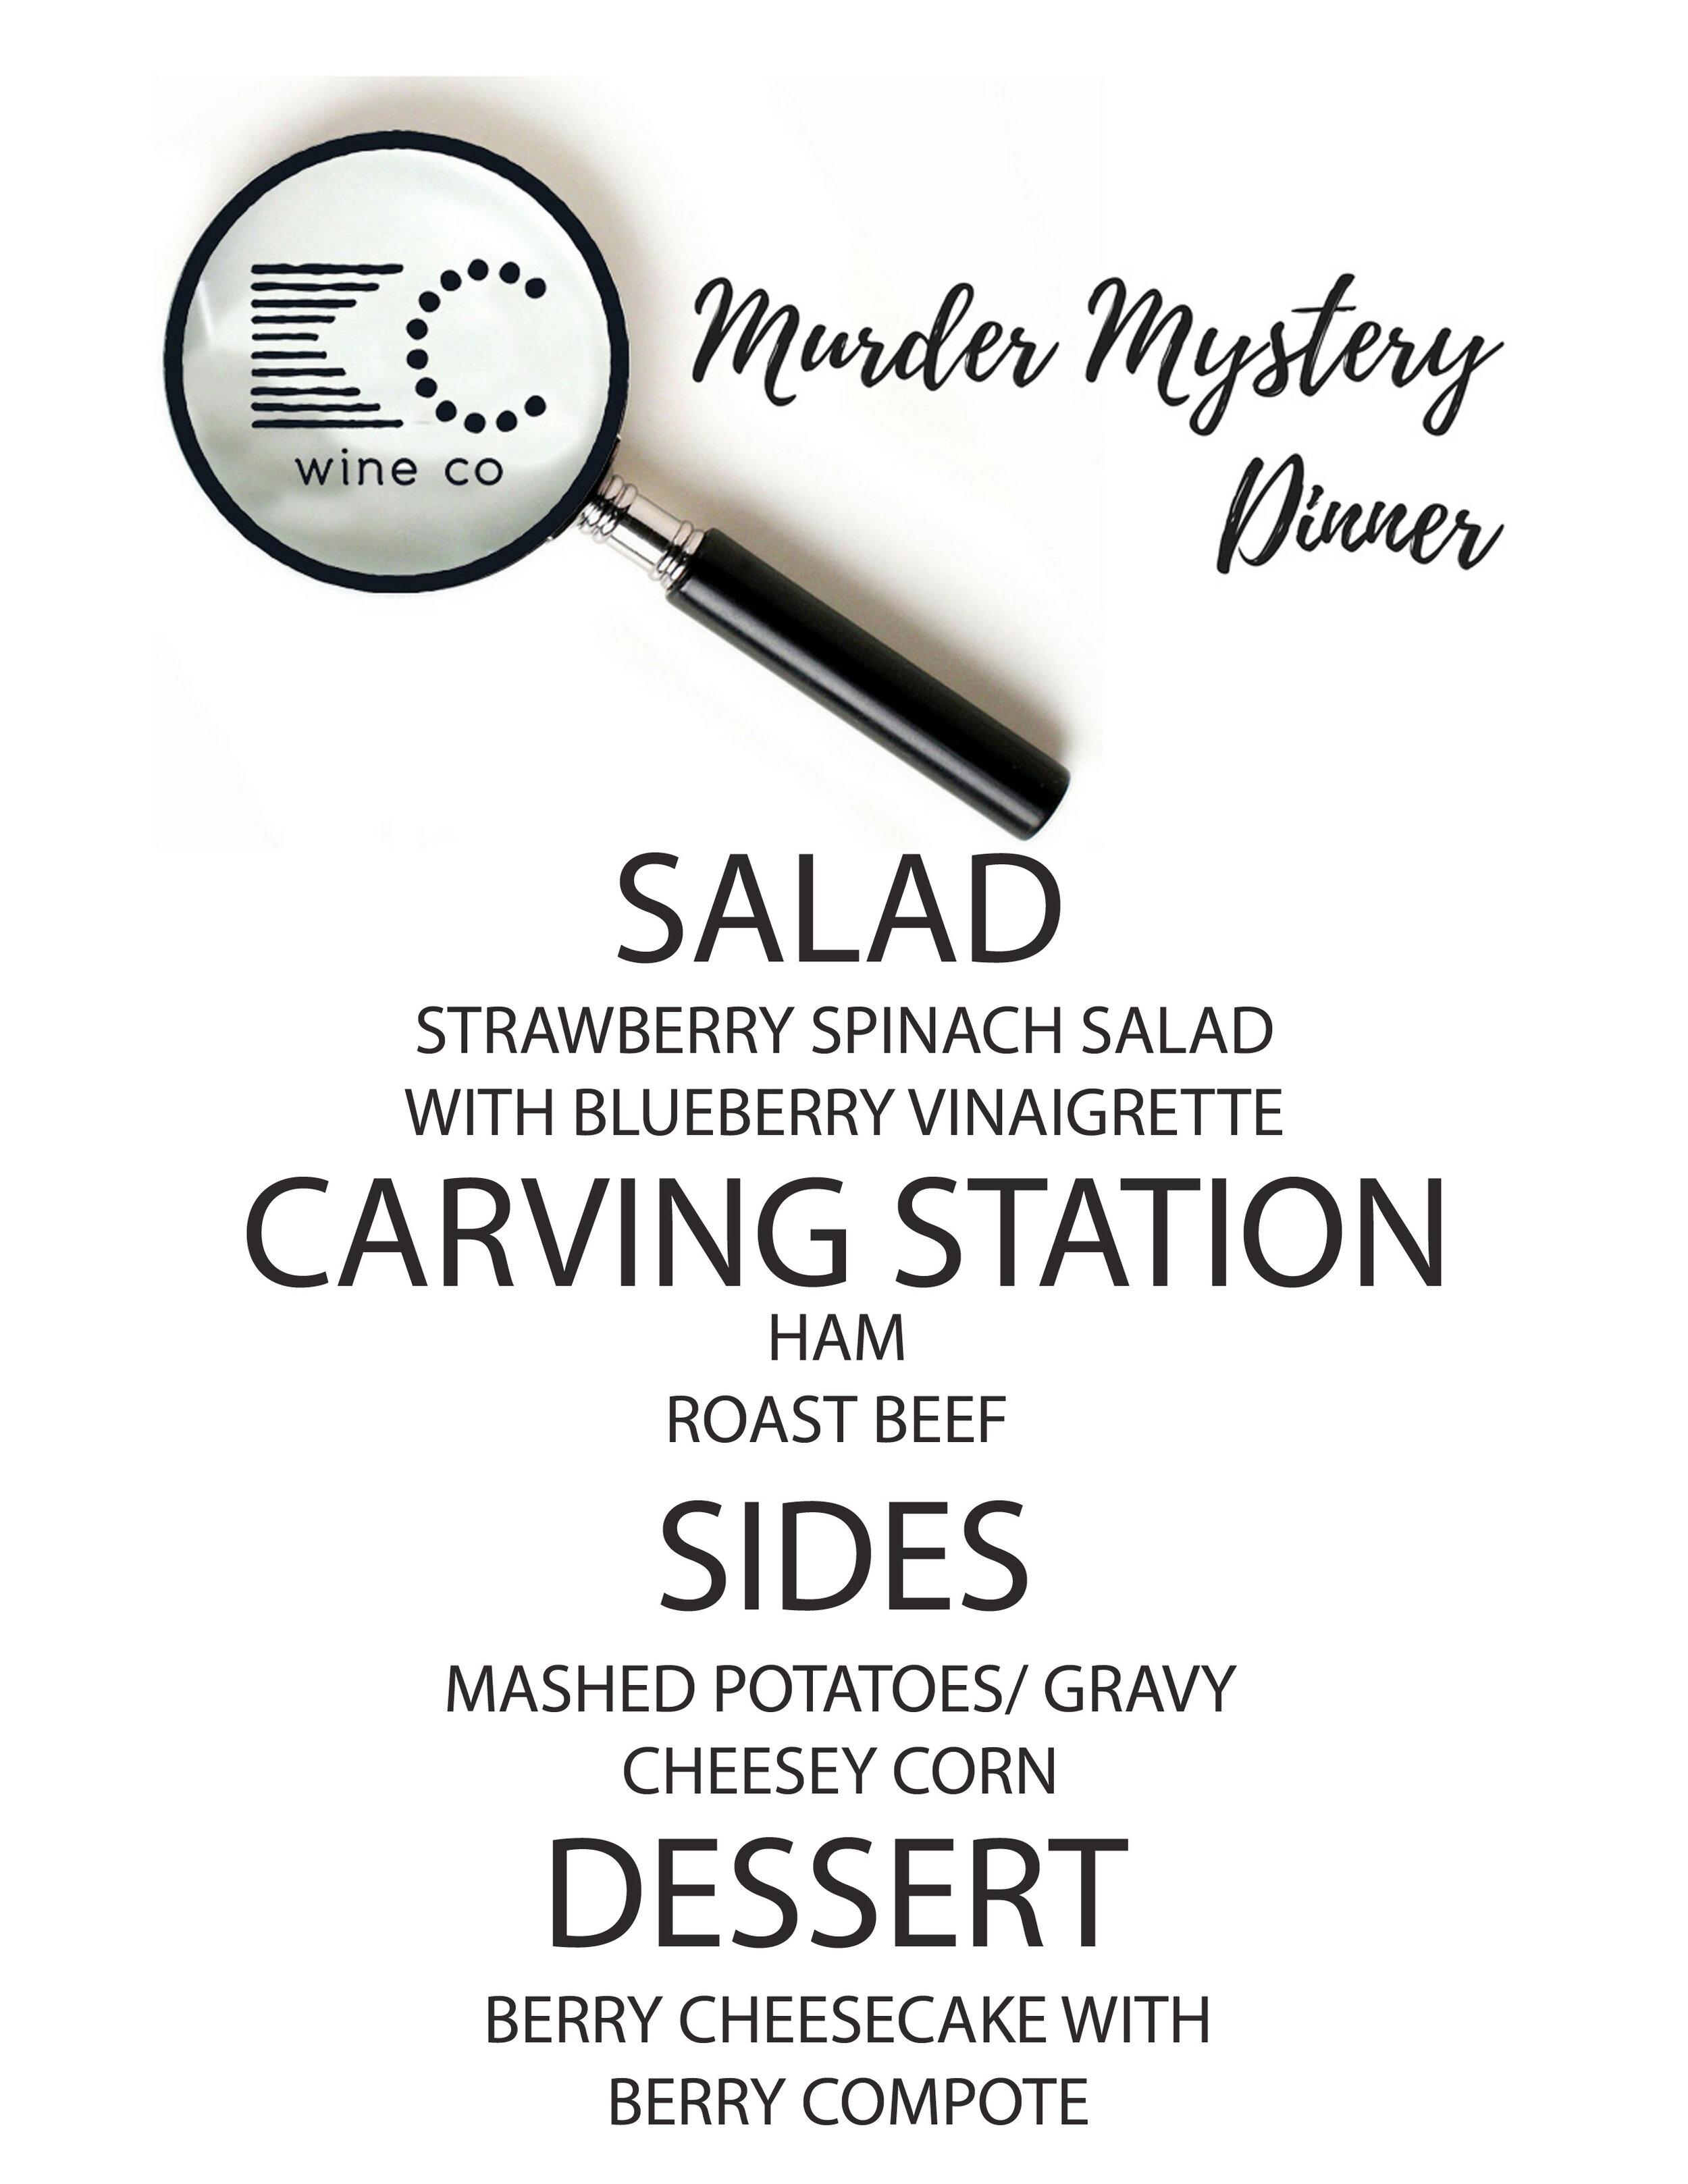 murder menu.jpg